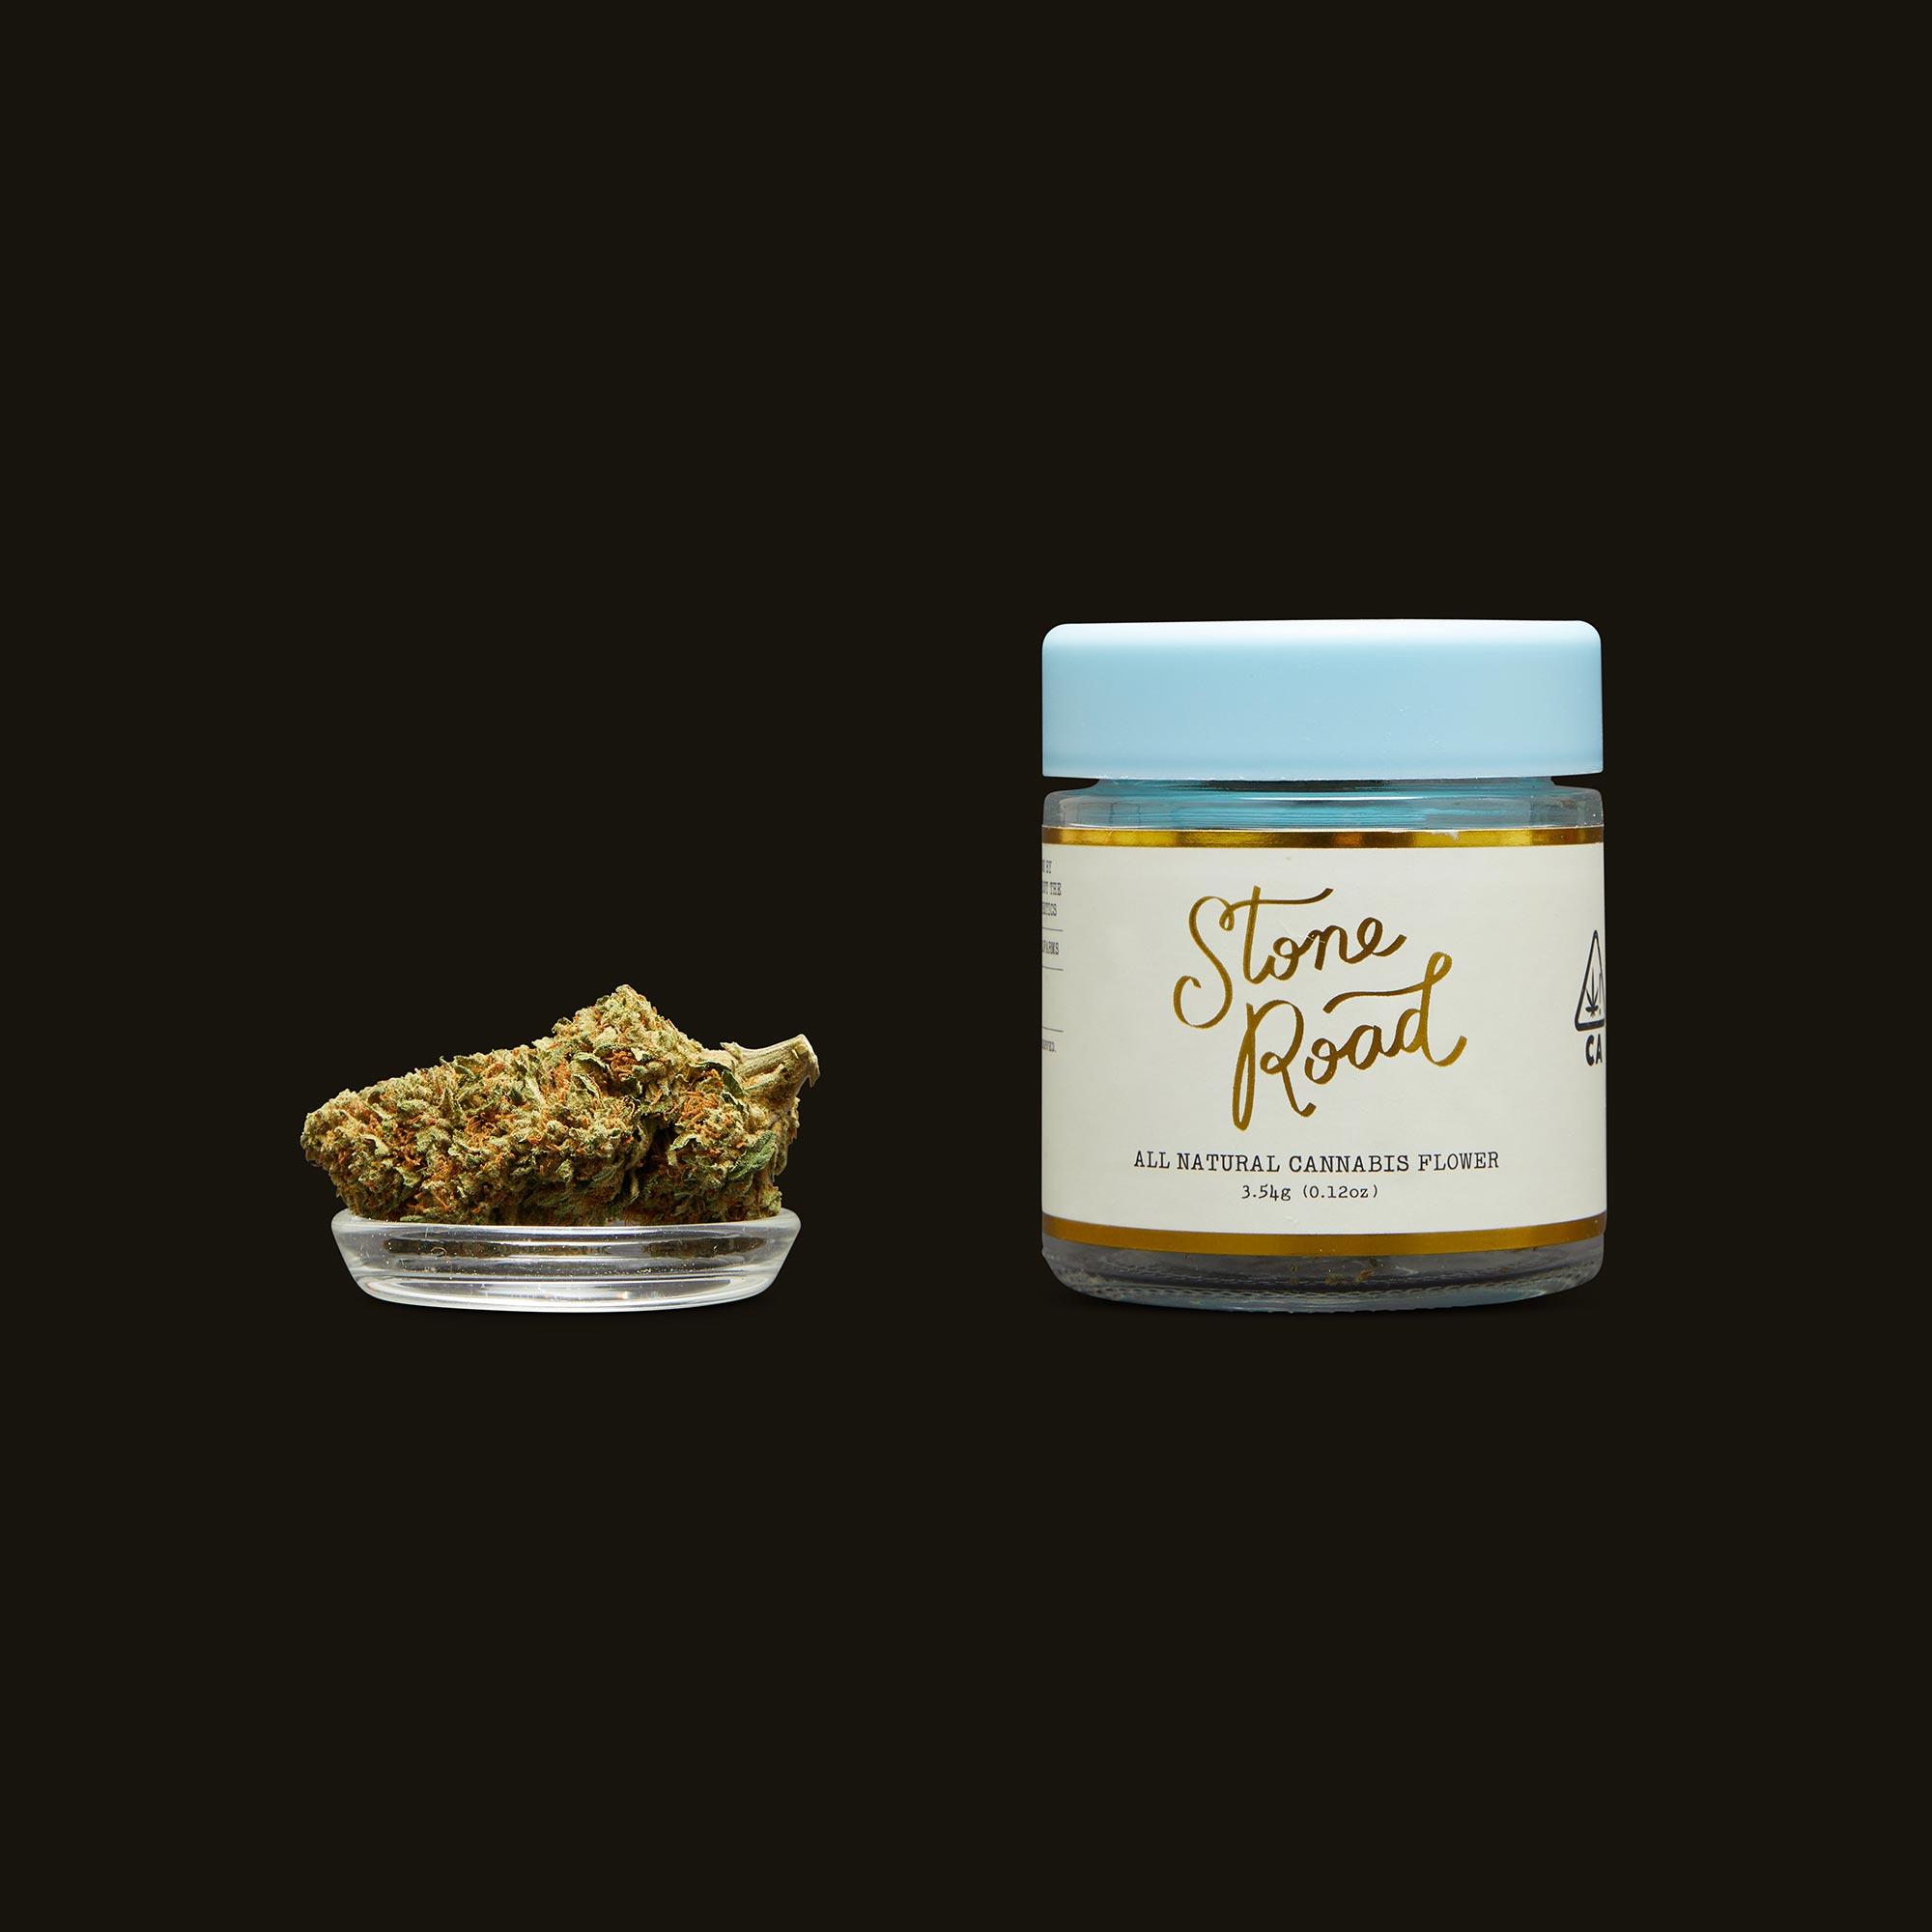 Stone Road Gold's Gift 20:1 CBD